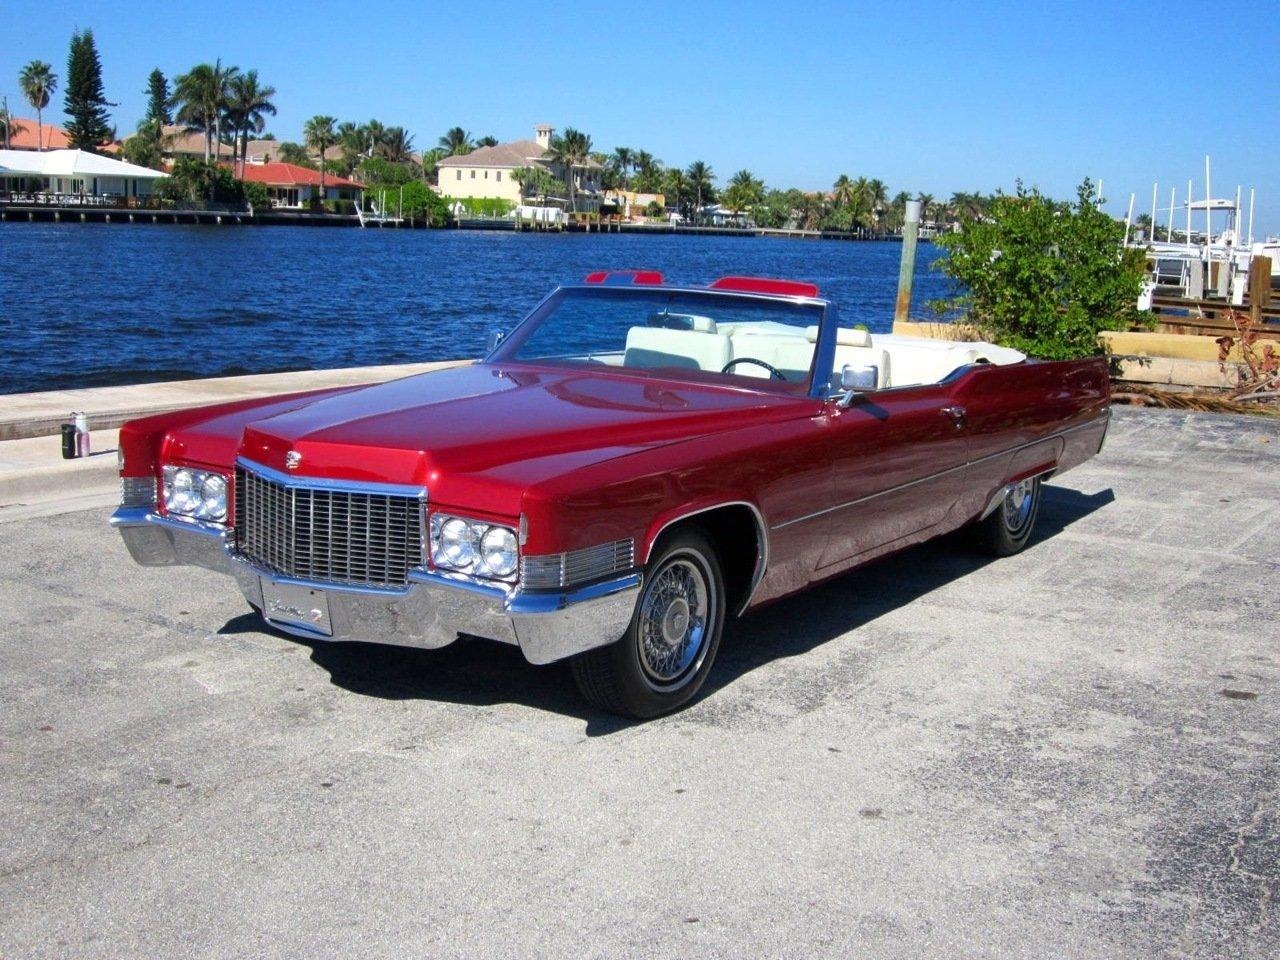 1970 Cadillac DeVille for sale #108252 | MCG